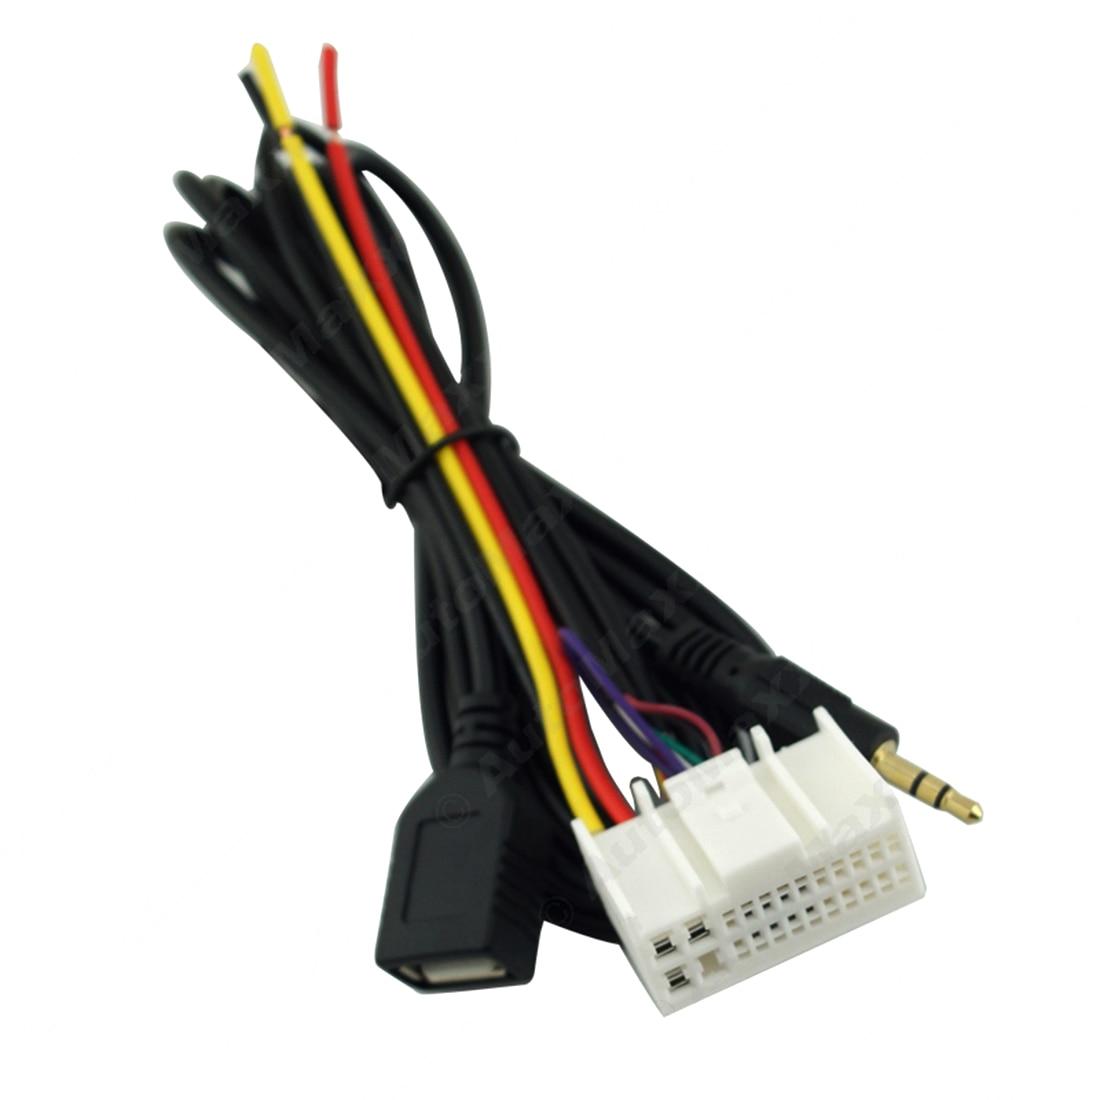 medium resolution of jvc kd r300 wiring harness adapter wiring diagram fascinatingjvc kd r300 wiring harness adapter wiring diagram